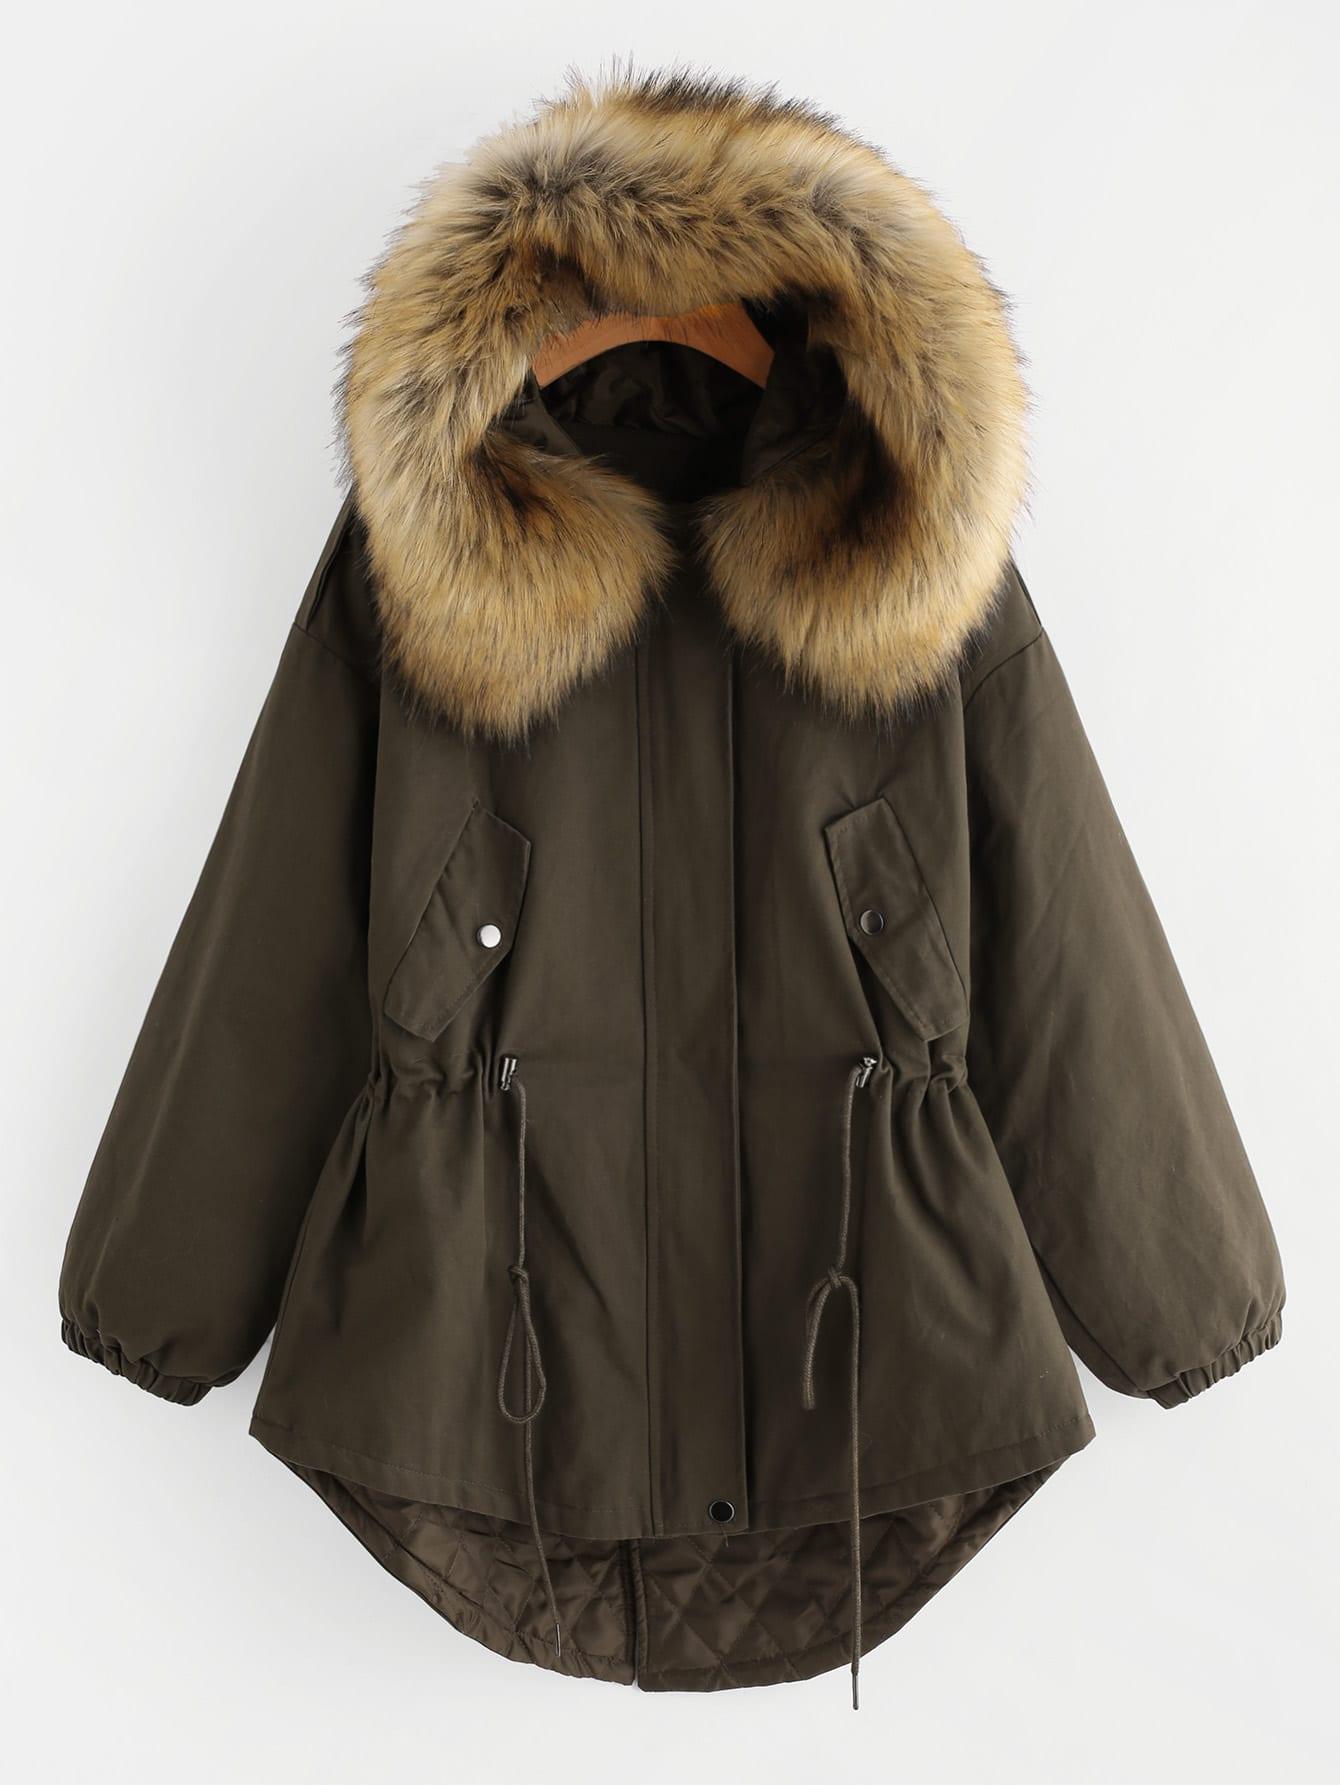 Faux Fur Lined Parka Coat faux fur lined parka coat